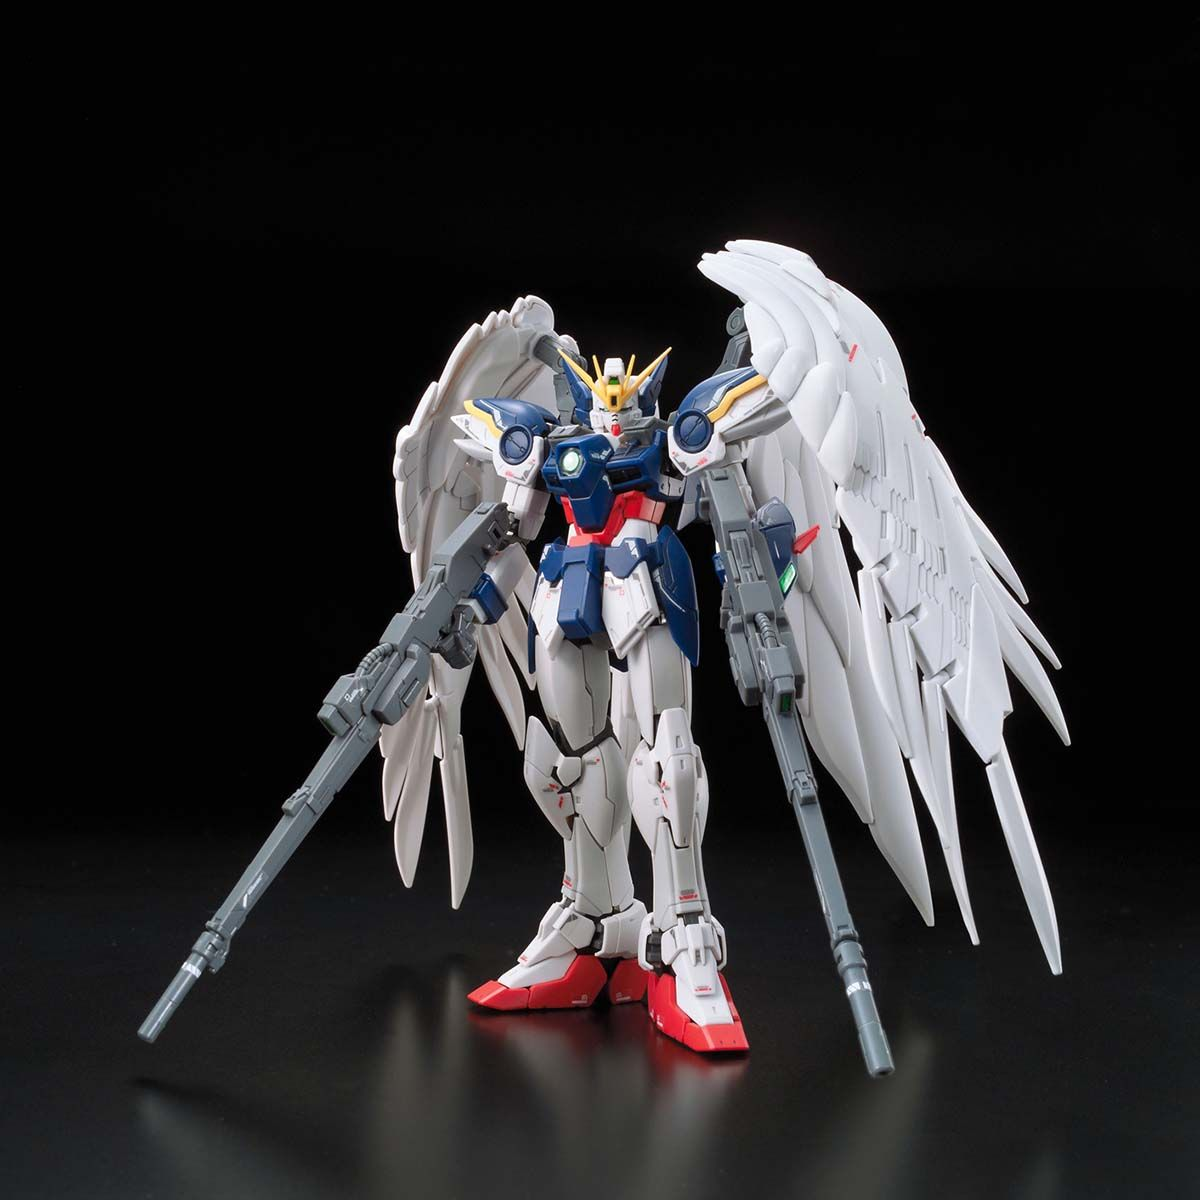 RG 1/144 飛翼鋼彈零式EW